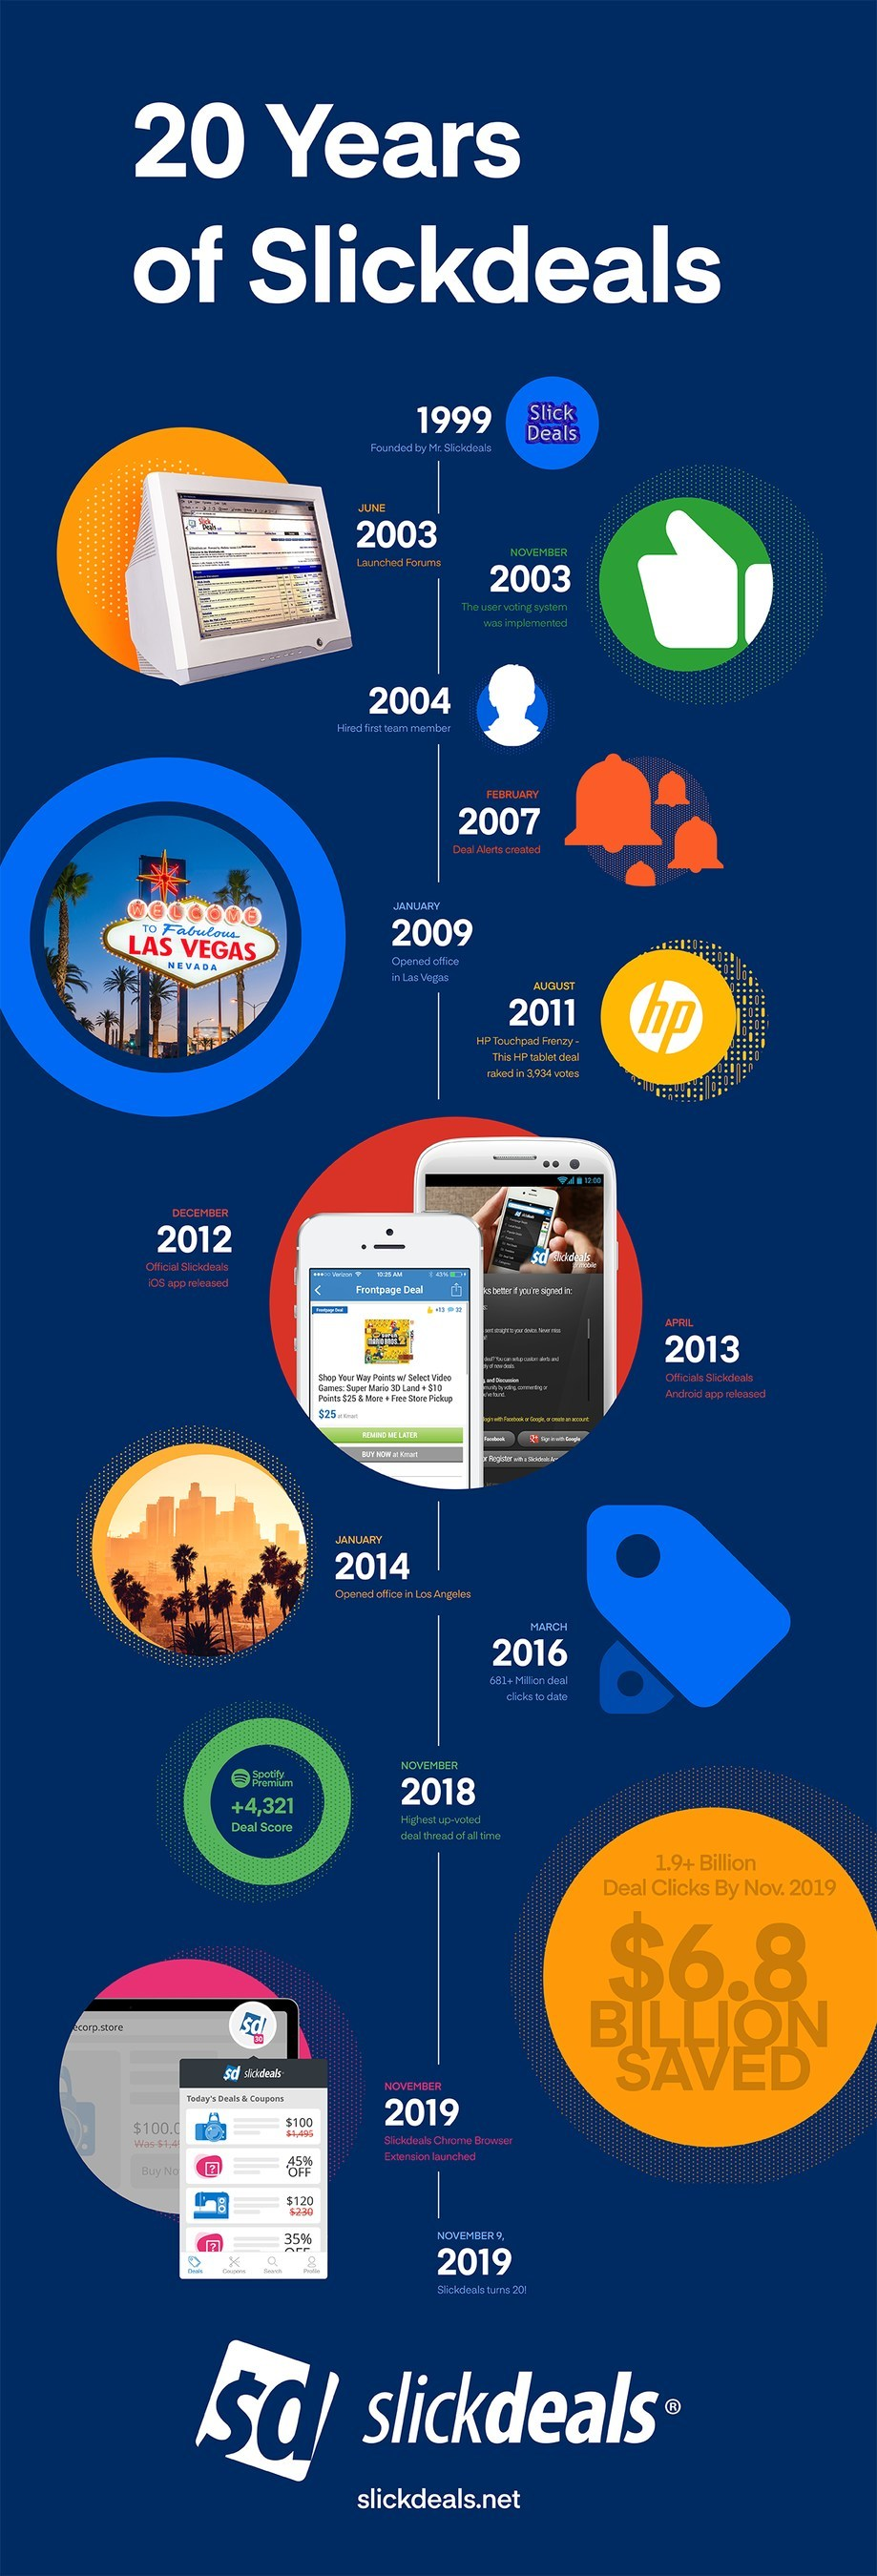 Slickdeals celebrates its 20 year anniversary